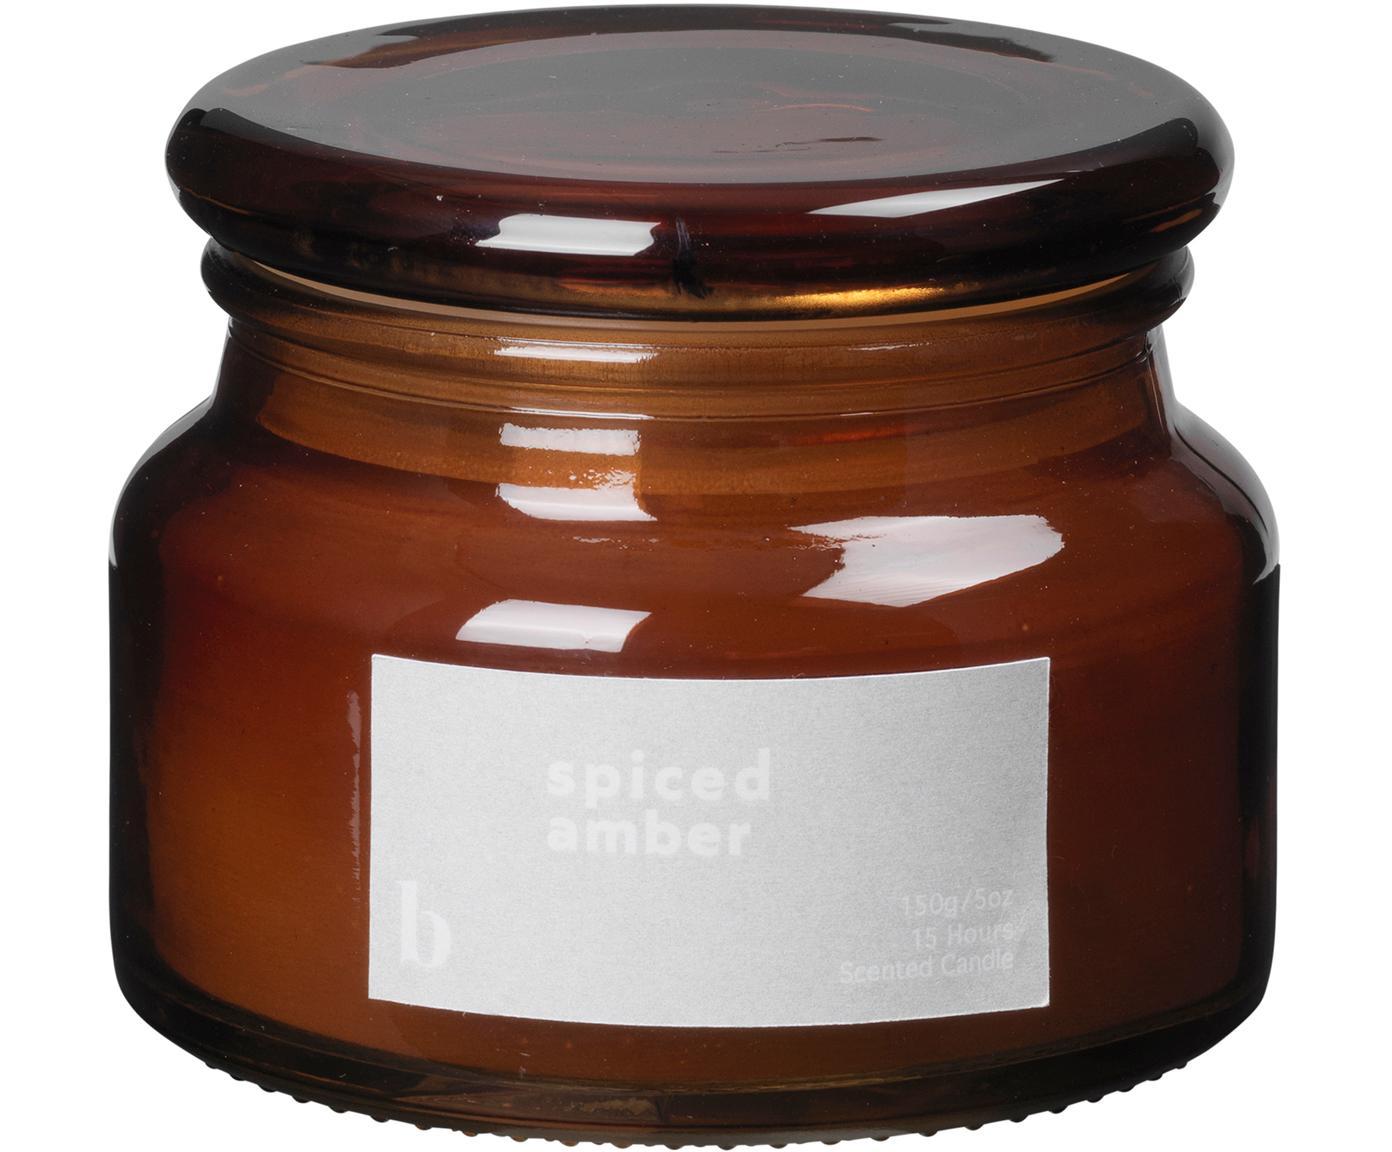 Duftkerze Spiced Amber, Behälter: Glas, Braun, Ø 10 x H 8 cm